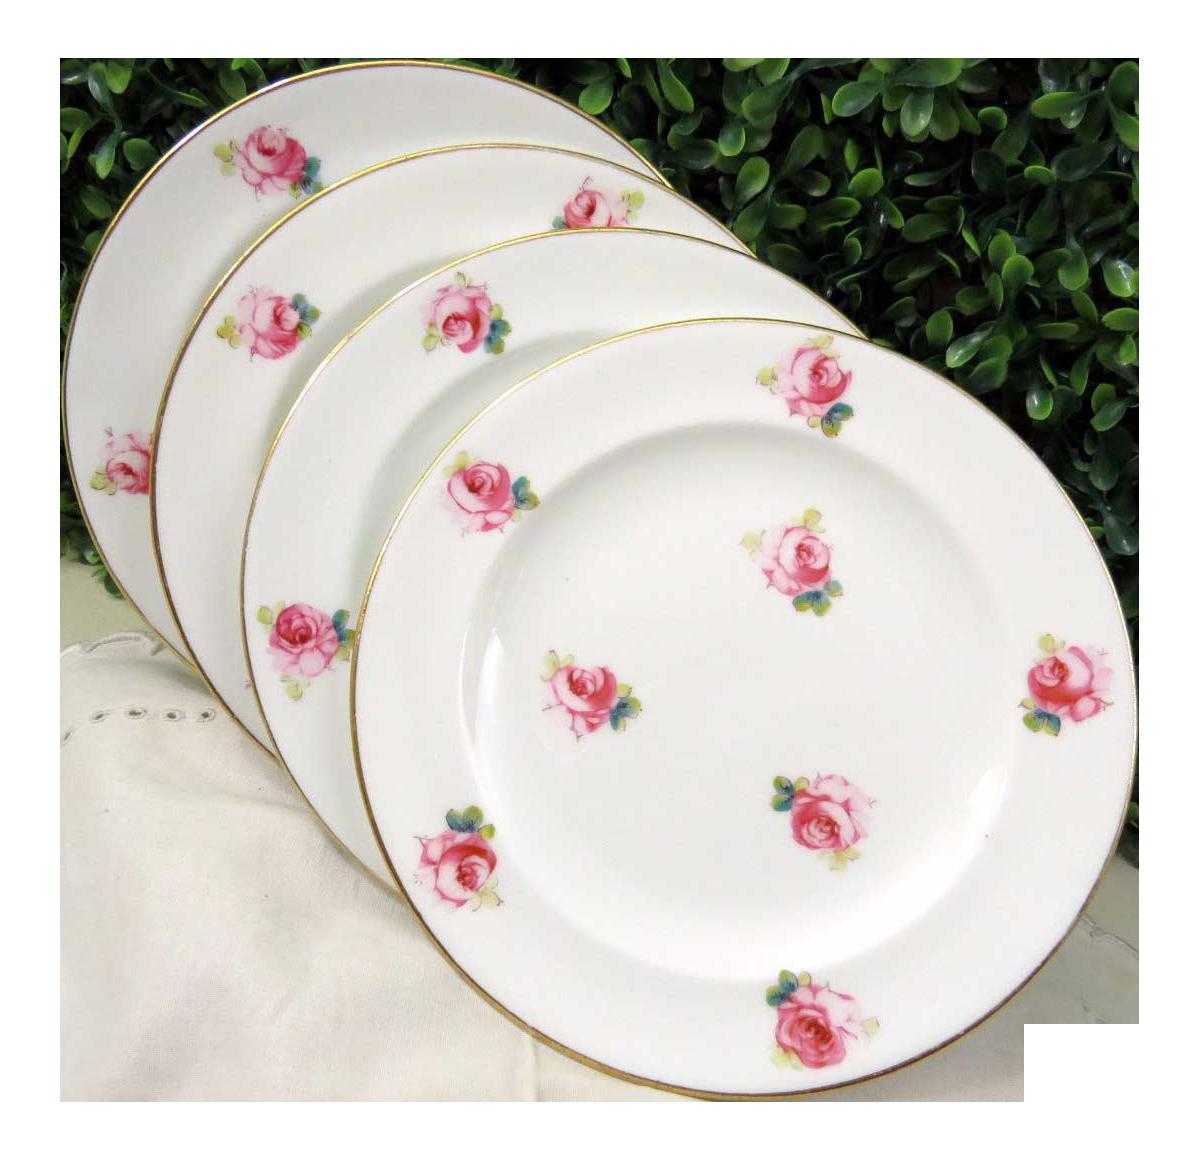 Royal Crown Derby Dessert Plates - Set of 4  sc 1 st  Chairish & Royal Crown Derby Dessert Plates - Set of 4 | Chairish